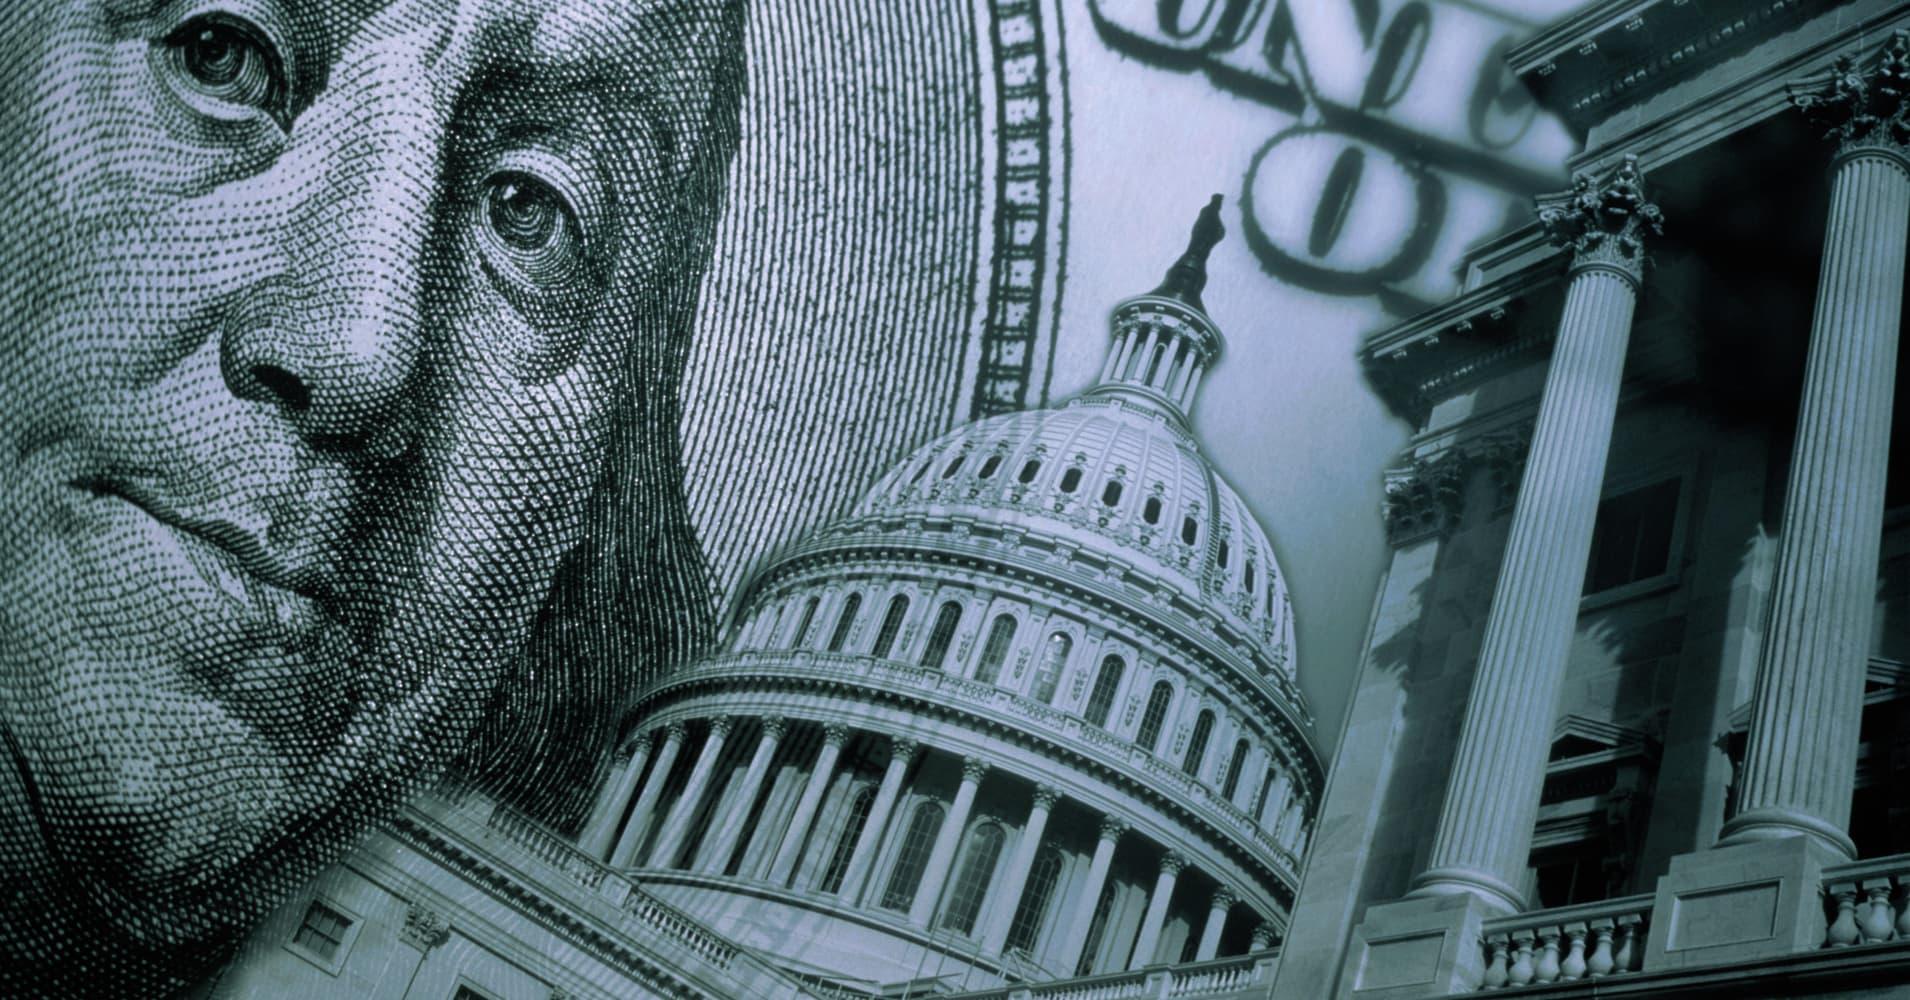 http://fm.cnbc.com/applications/cnbc.com/resources/img/editorial/2012/12/19/100328737-dollar-bill-us-government-politics-gettyp.1910x1000.jpg